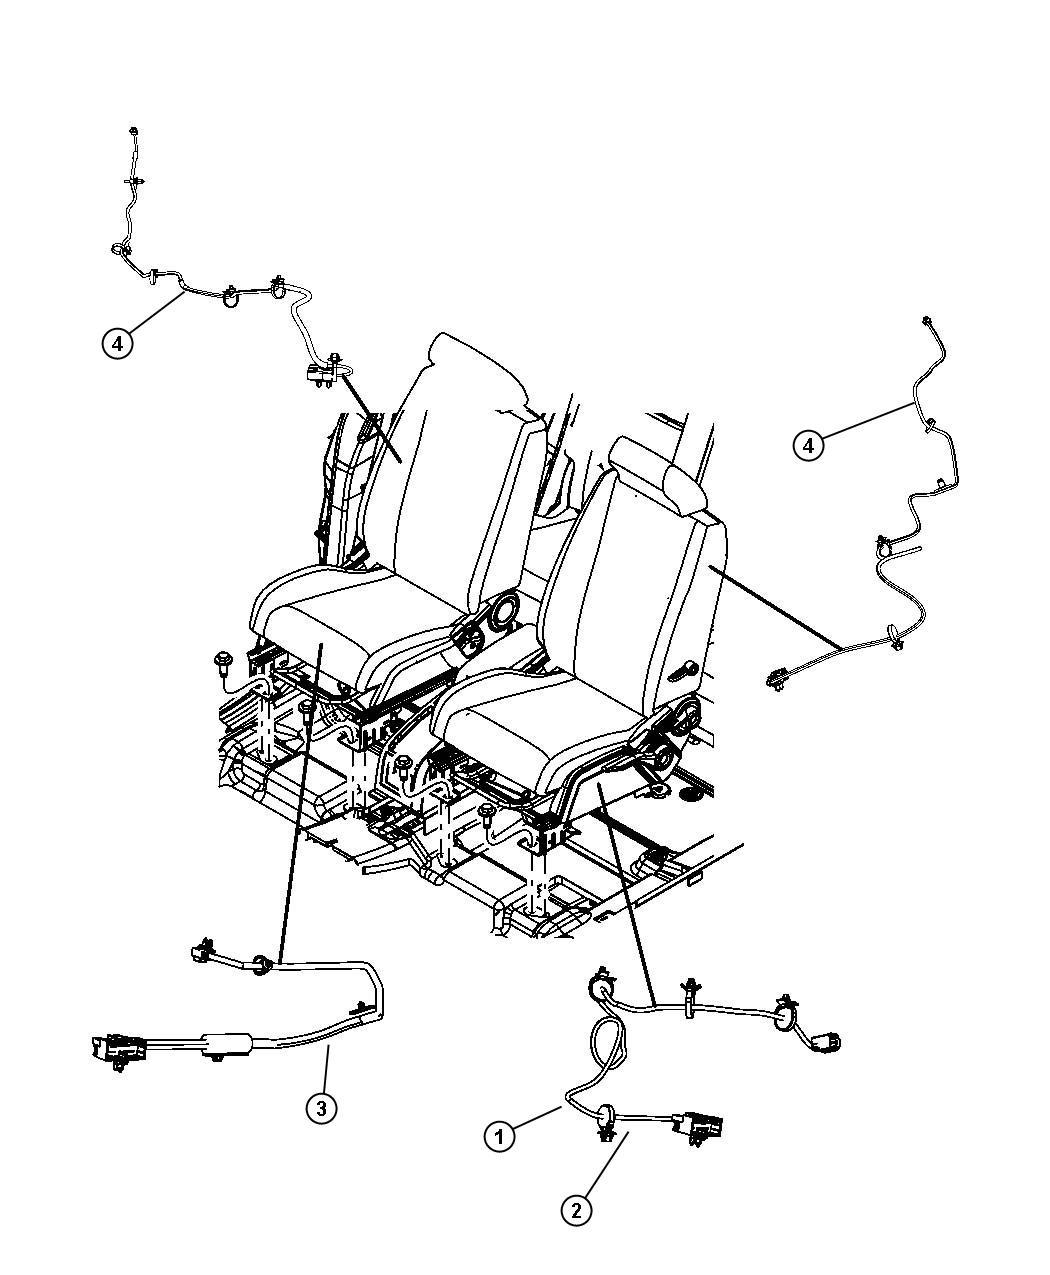 2010 Dodge Journey Wiring  Power Seat  6 Way  Seat Track